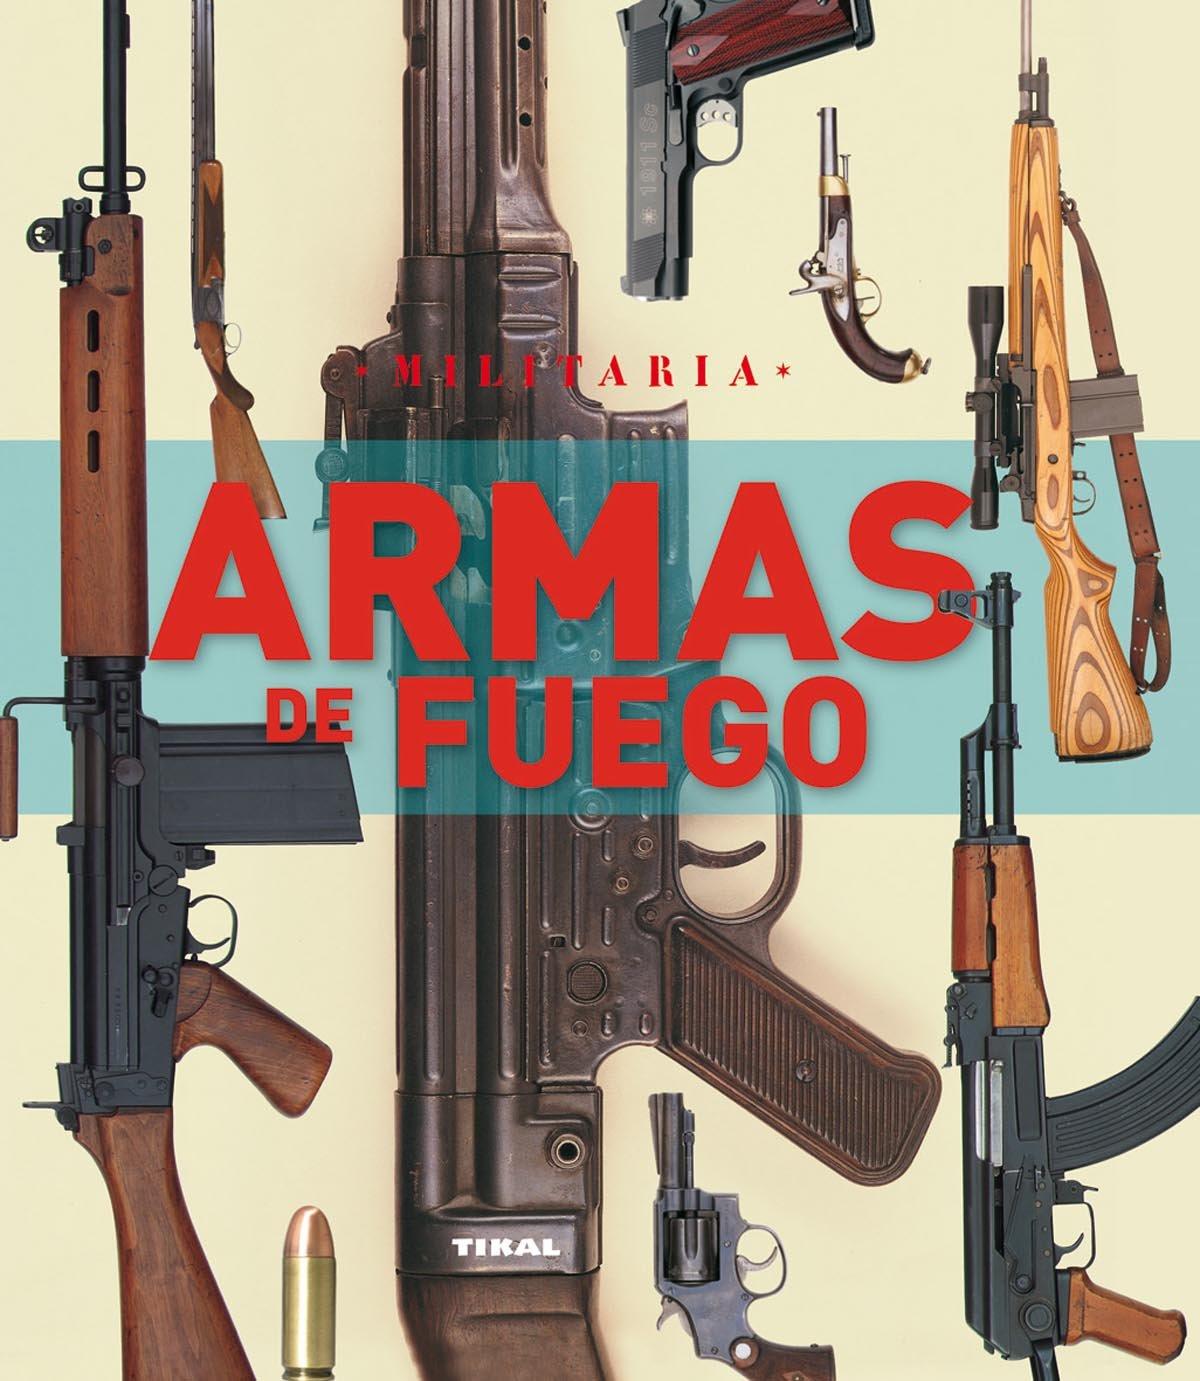 Armas de fuego (Militaria) Tapa blanda – 27 may 2011 Aa.Vv. TIKAL 849928065X 1867432